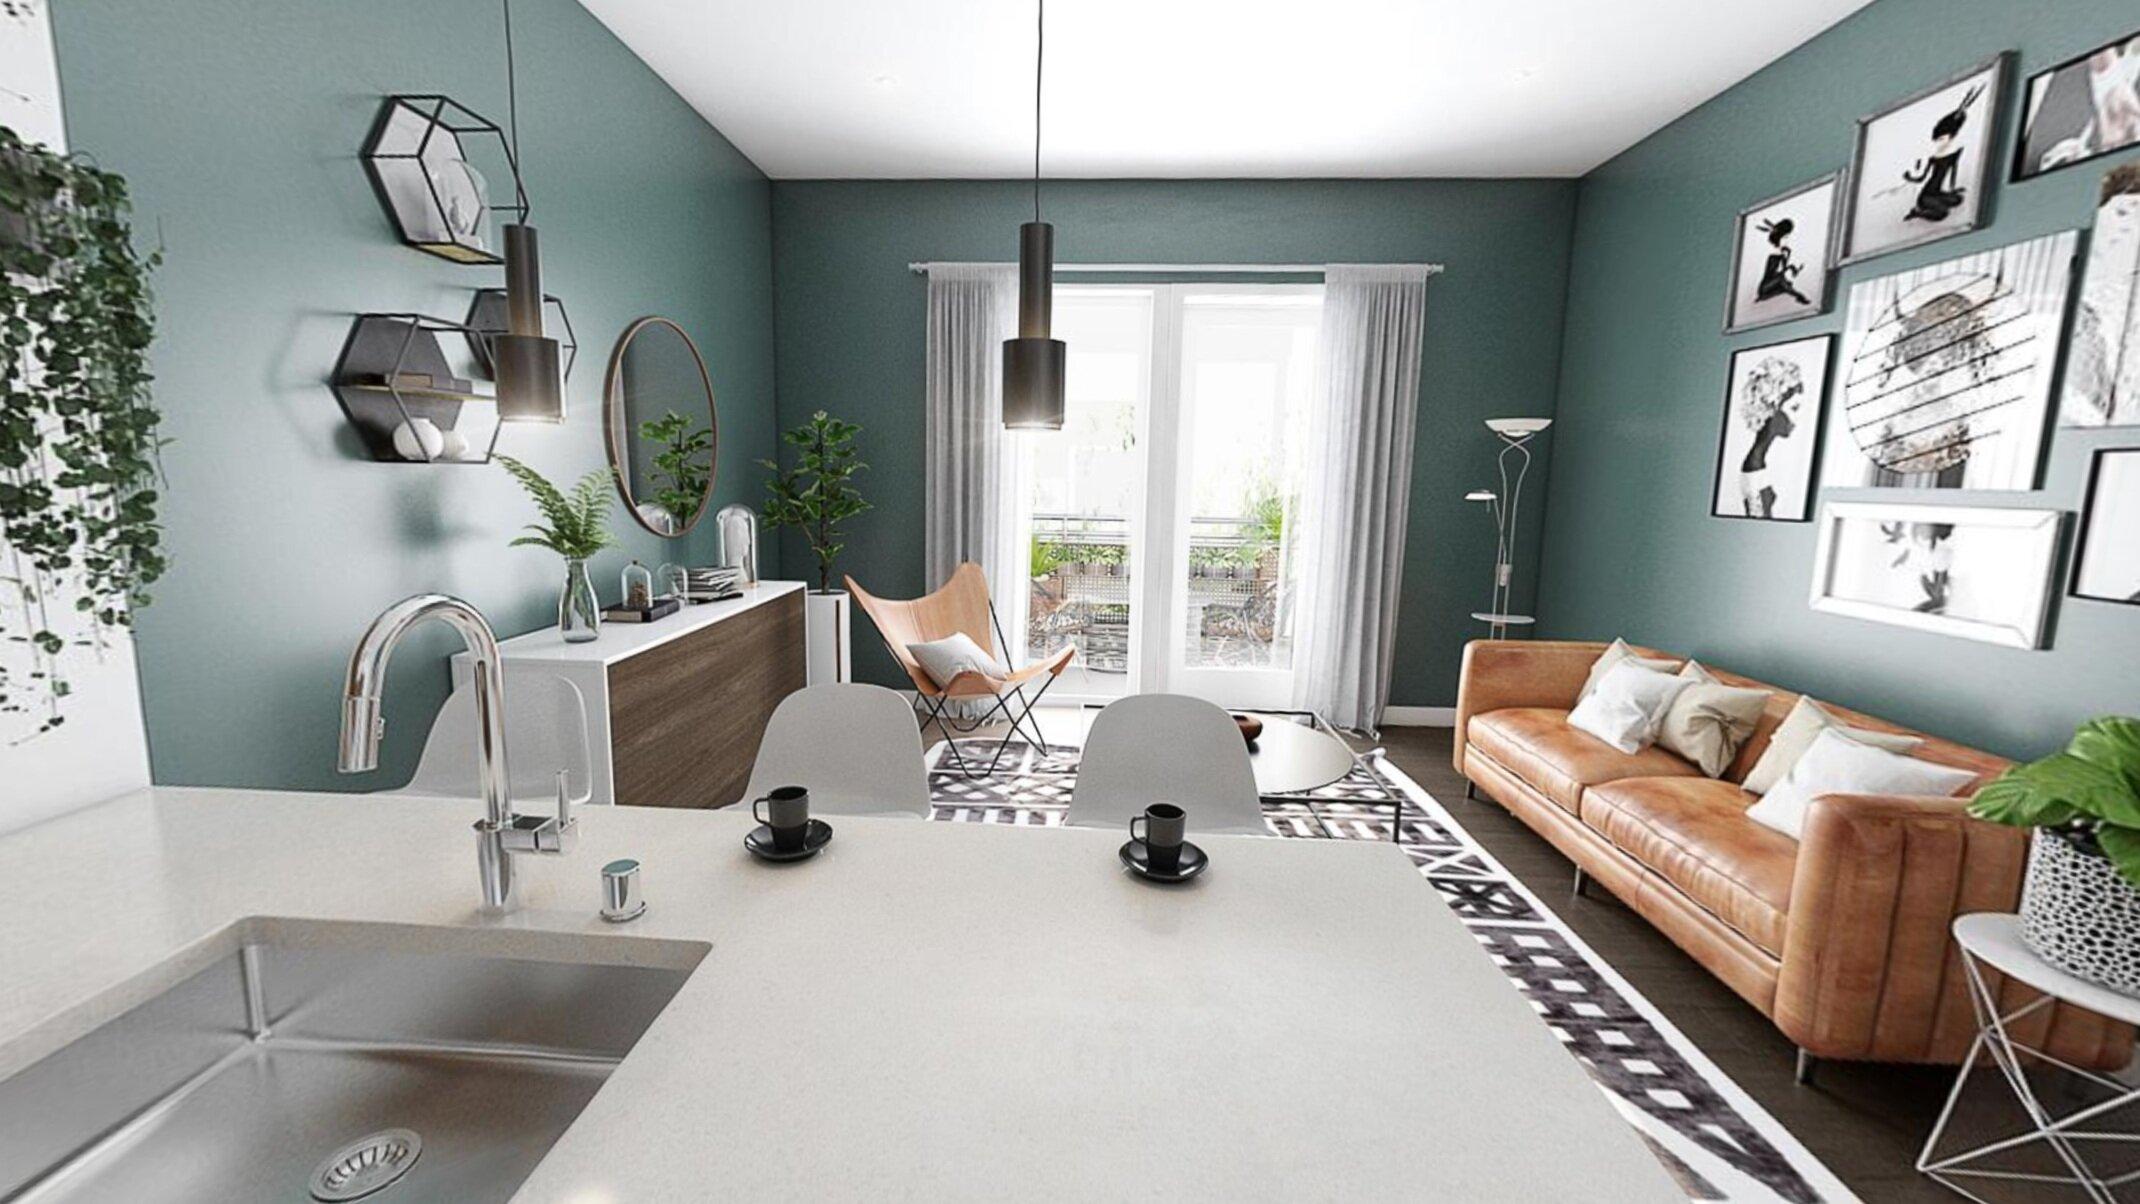 Variel - New furnishings and unit interiors